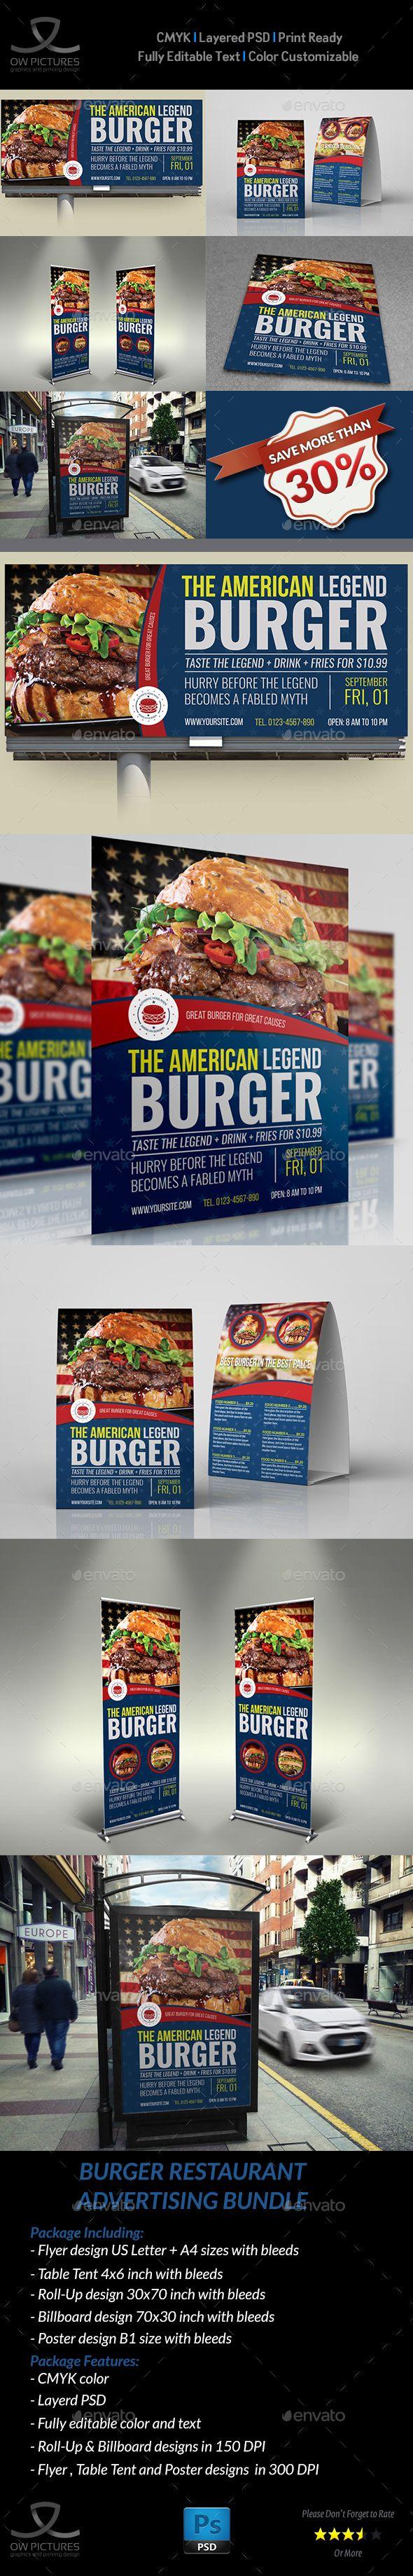 Burger Restaurant Advertising Bundle Vol.4 by OWPictures Advertising Bundle Desc...